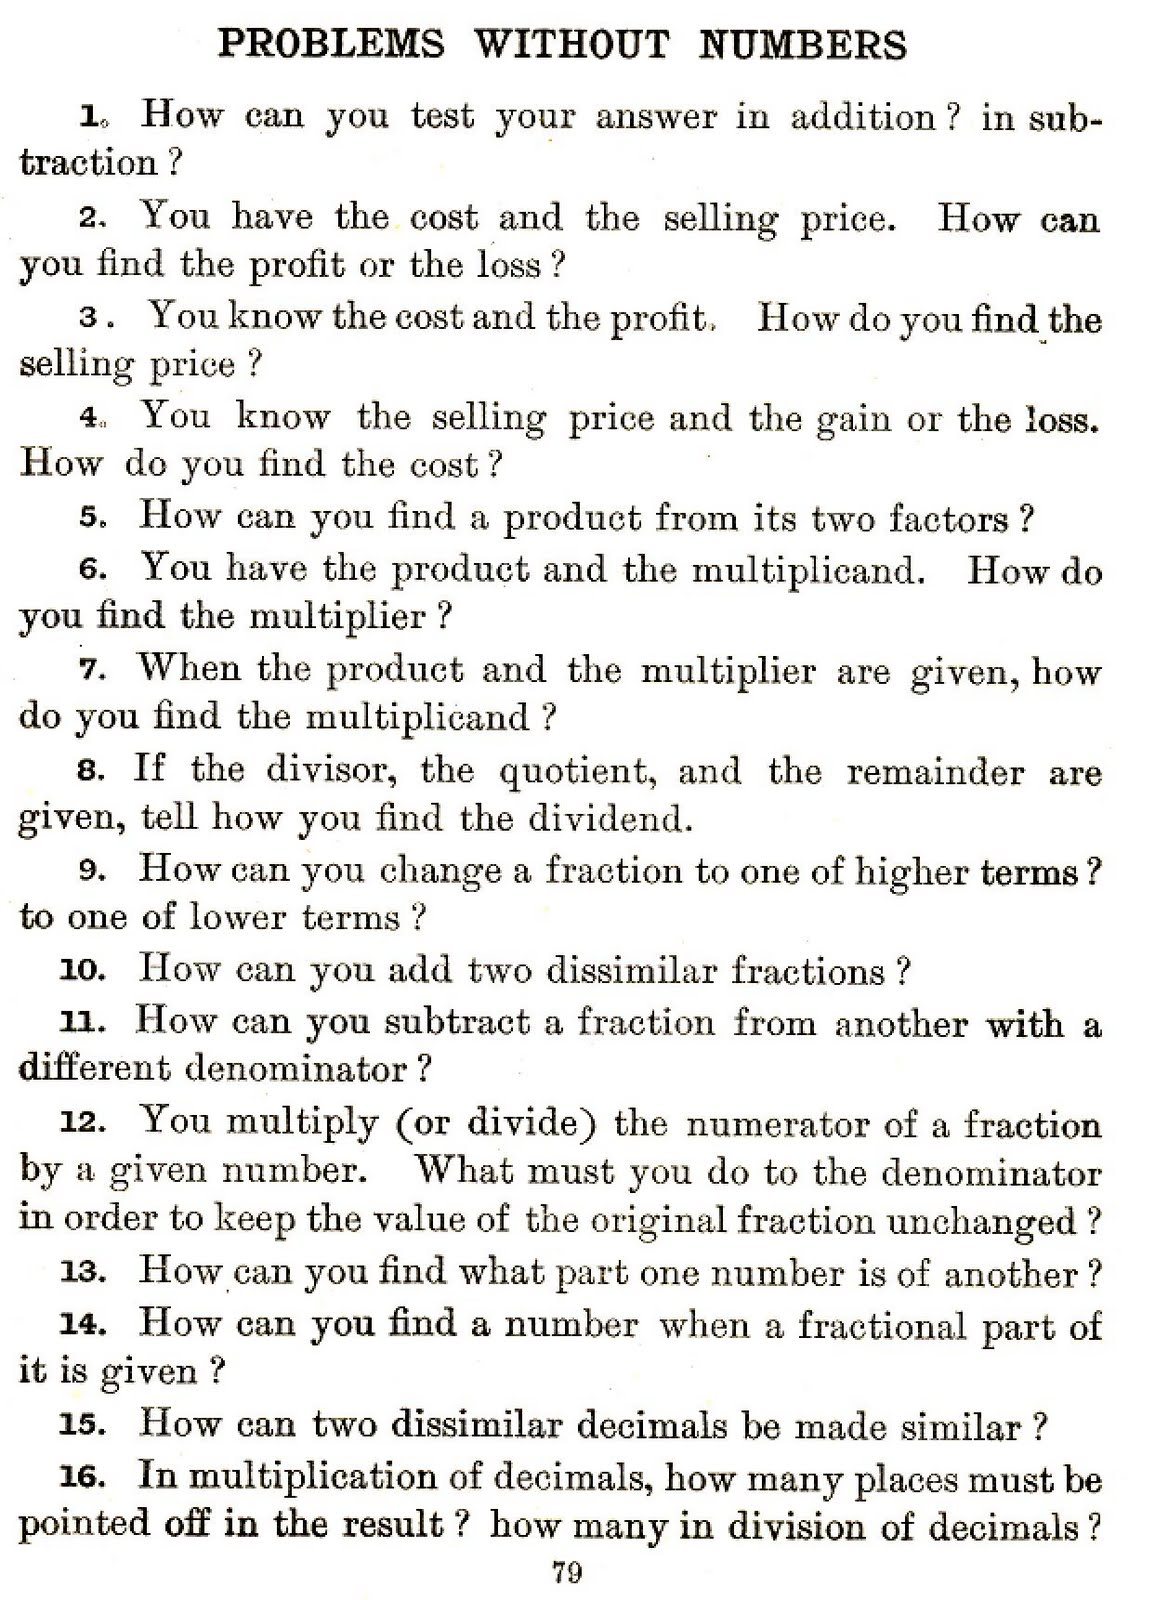 6th Grade Fraction Word Problems Worksheet